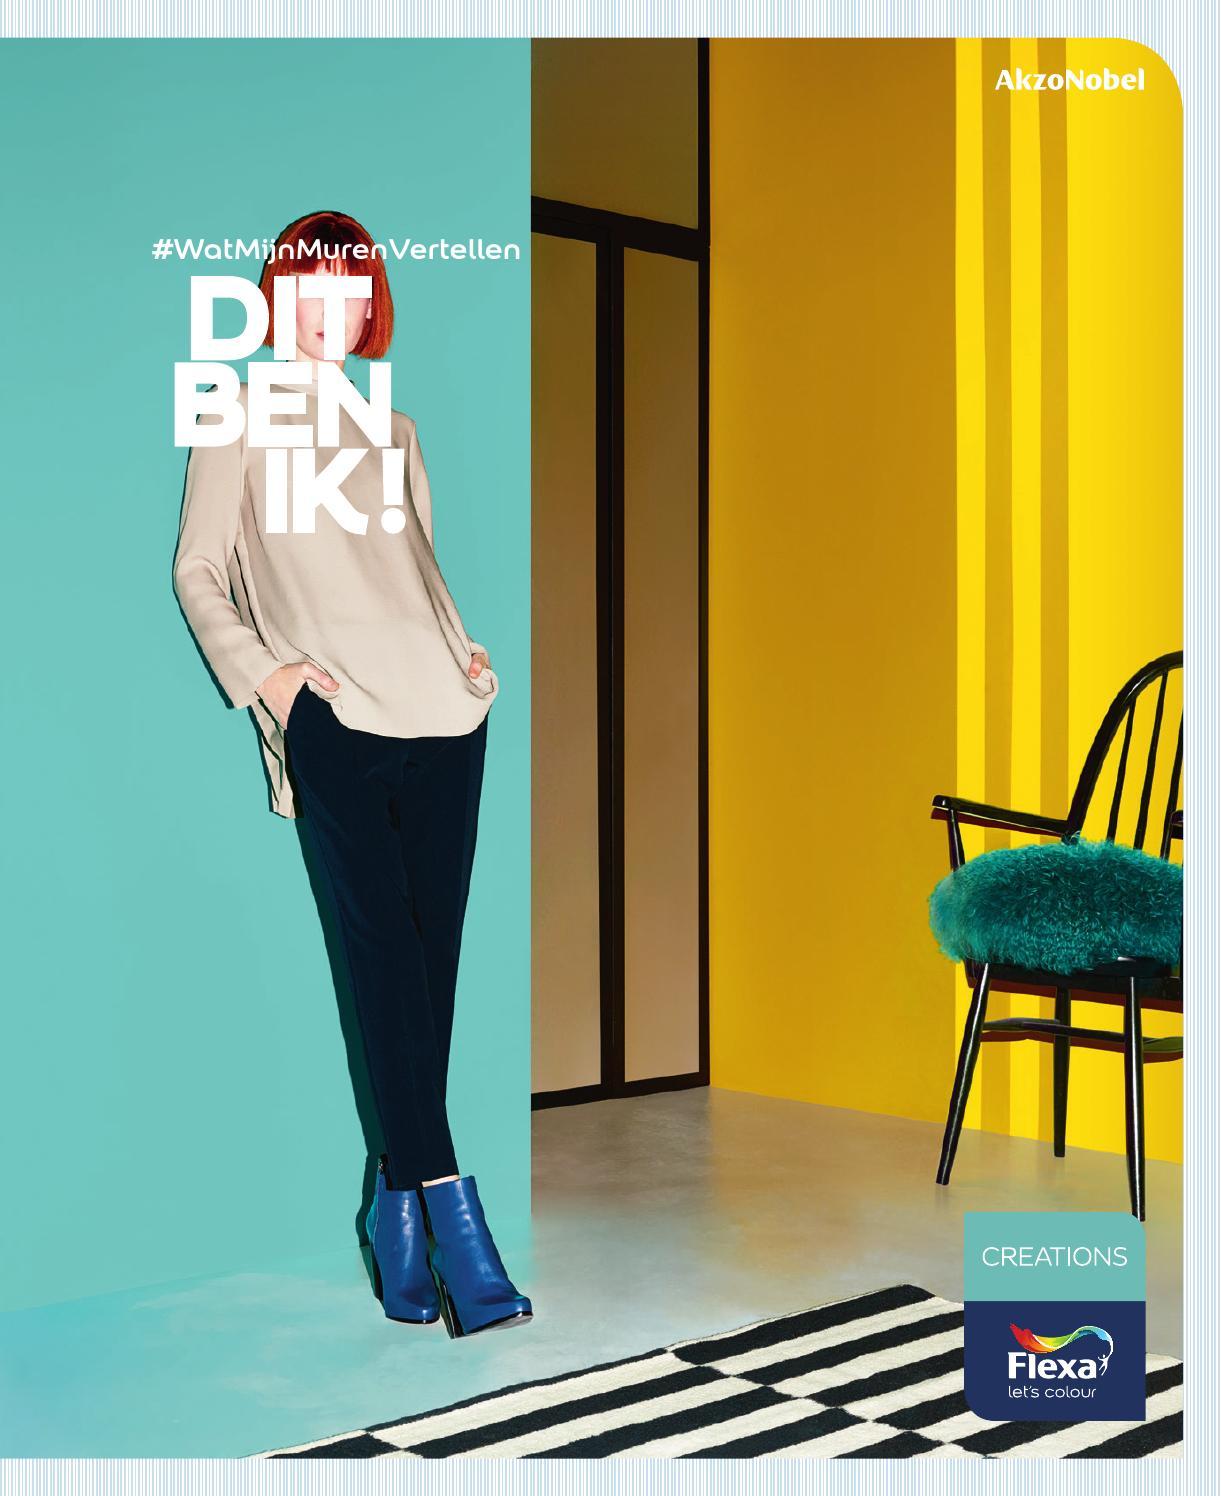 flexa early dew kopen : Flexa Creations Brochure 2014 By Akzonobel Decorative Coatings Bv